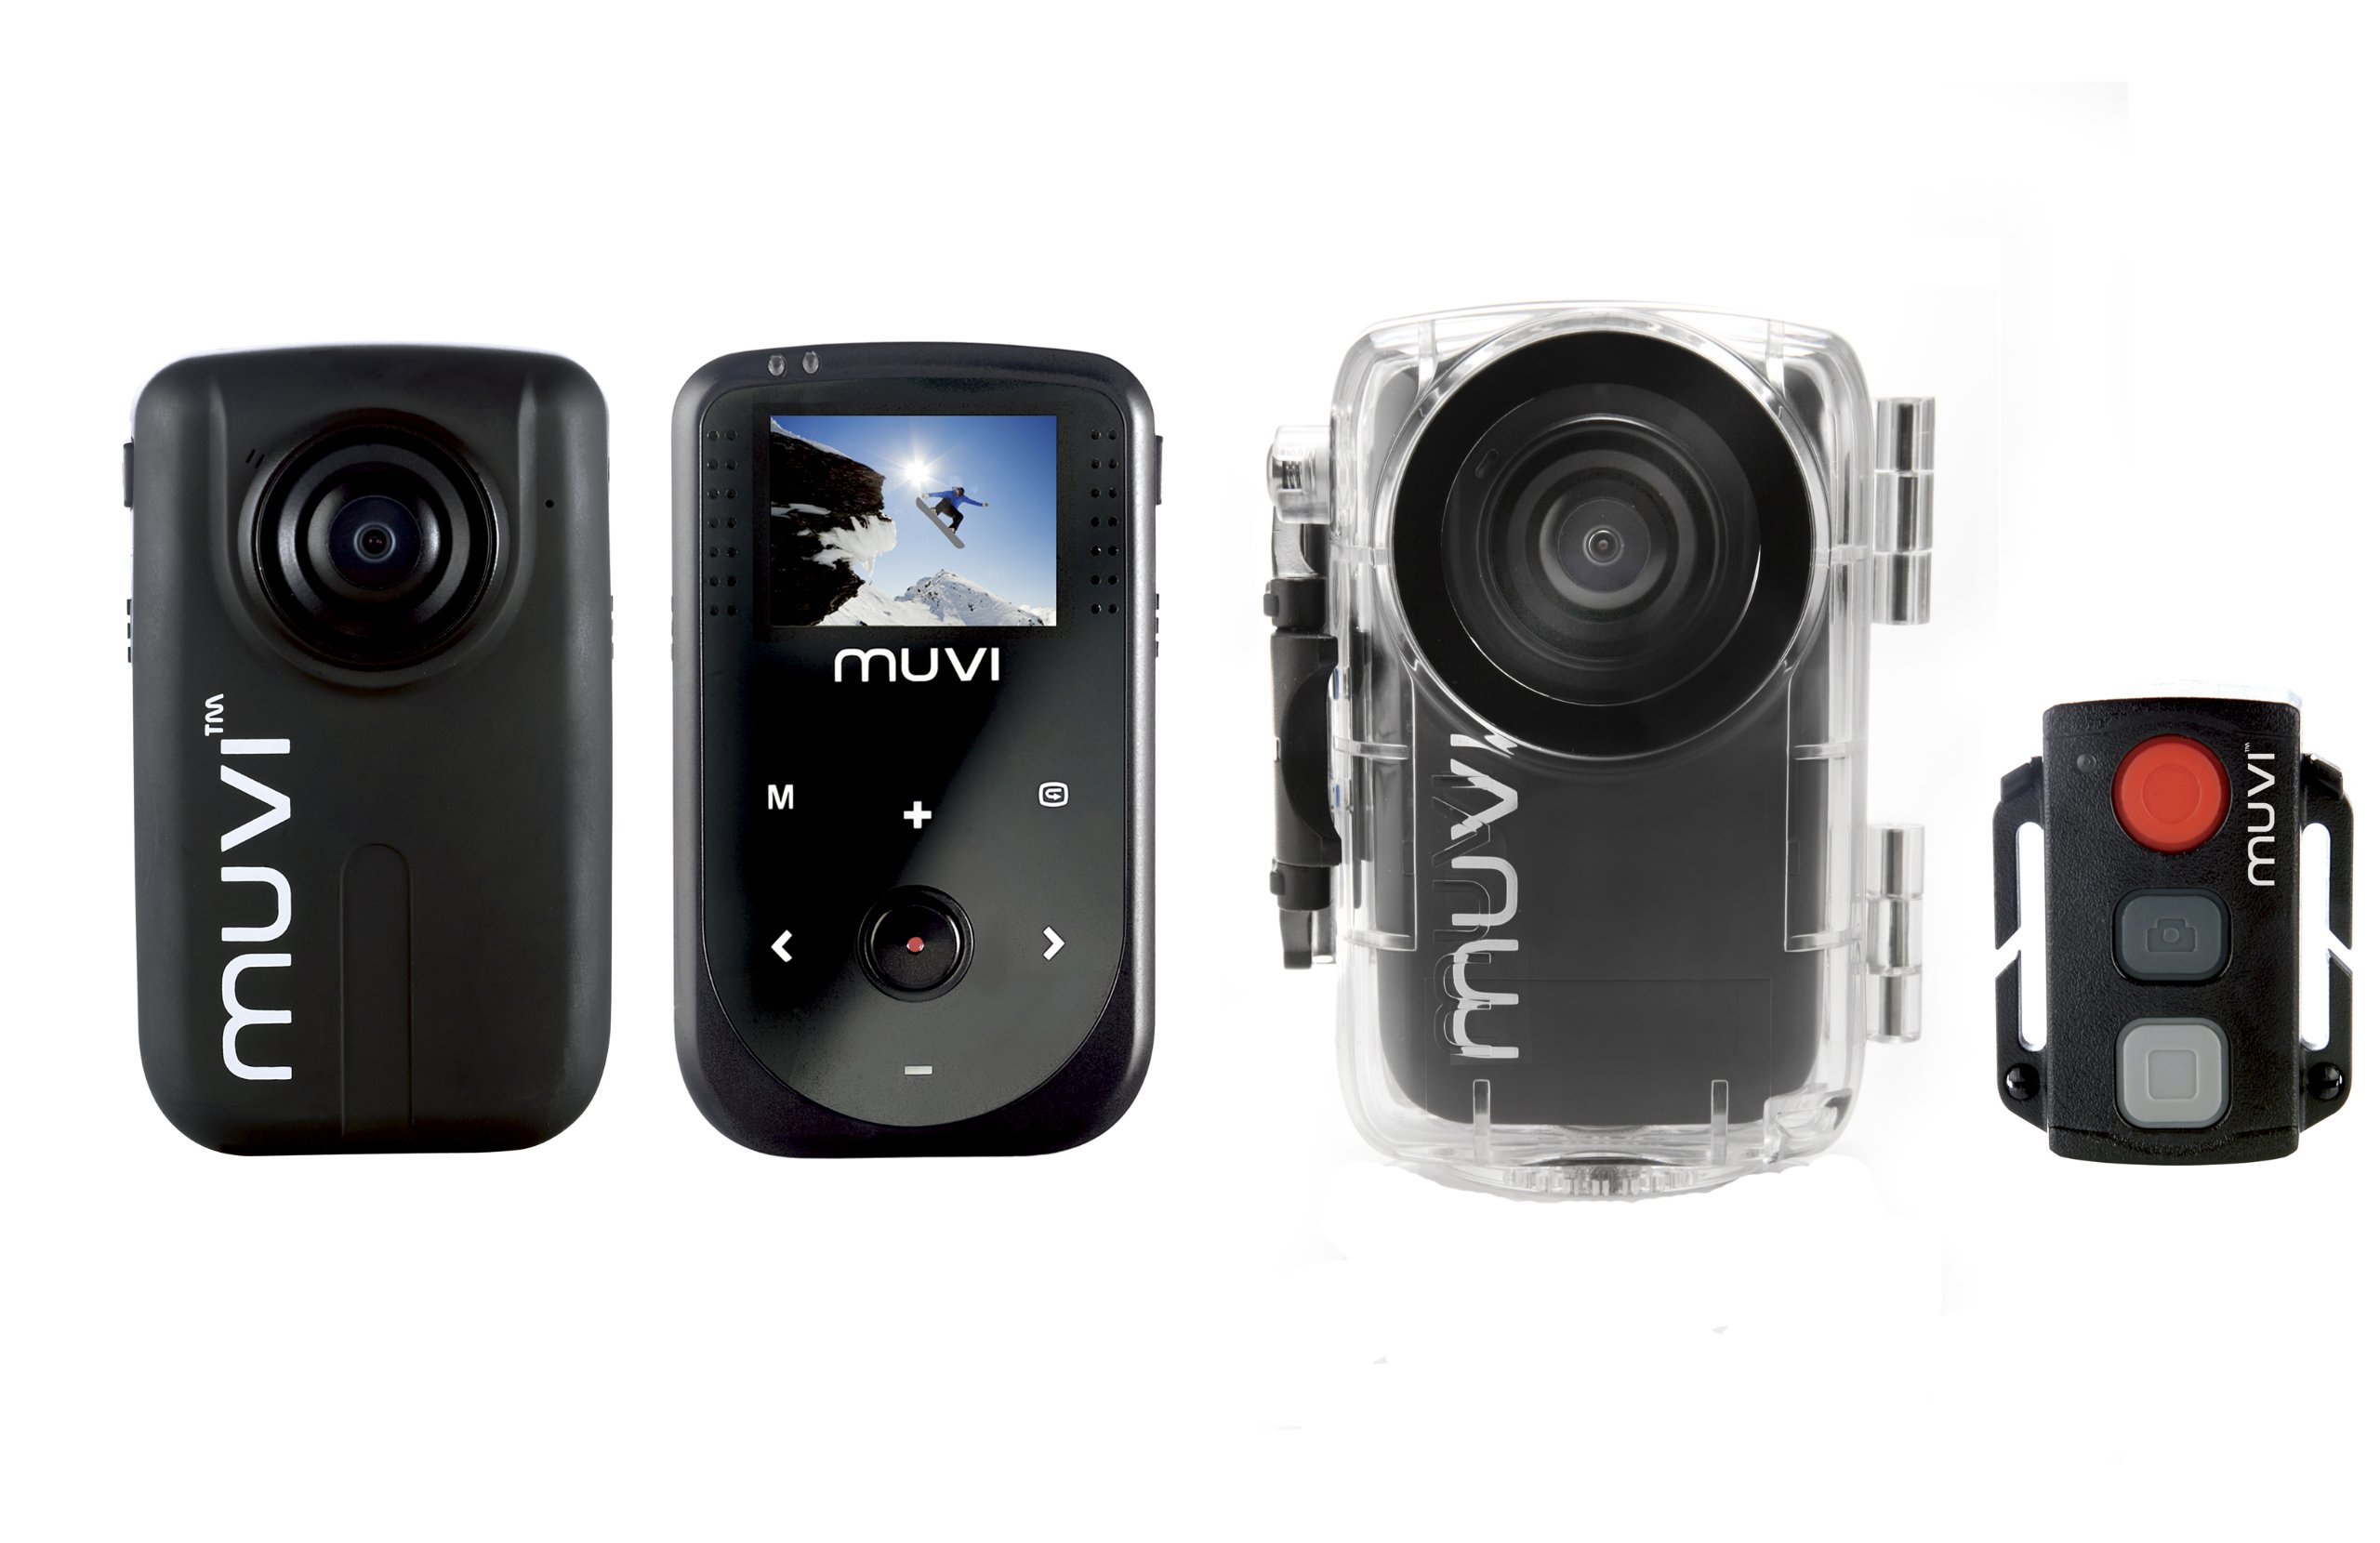 Veho Muvi 1080p HD Pro Mini Camera HD10 with Wireless Remote + Waterproof Case